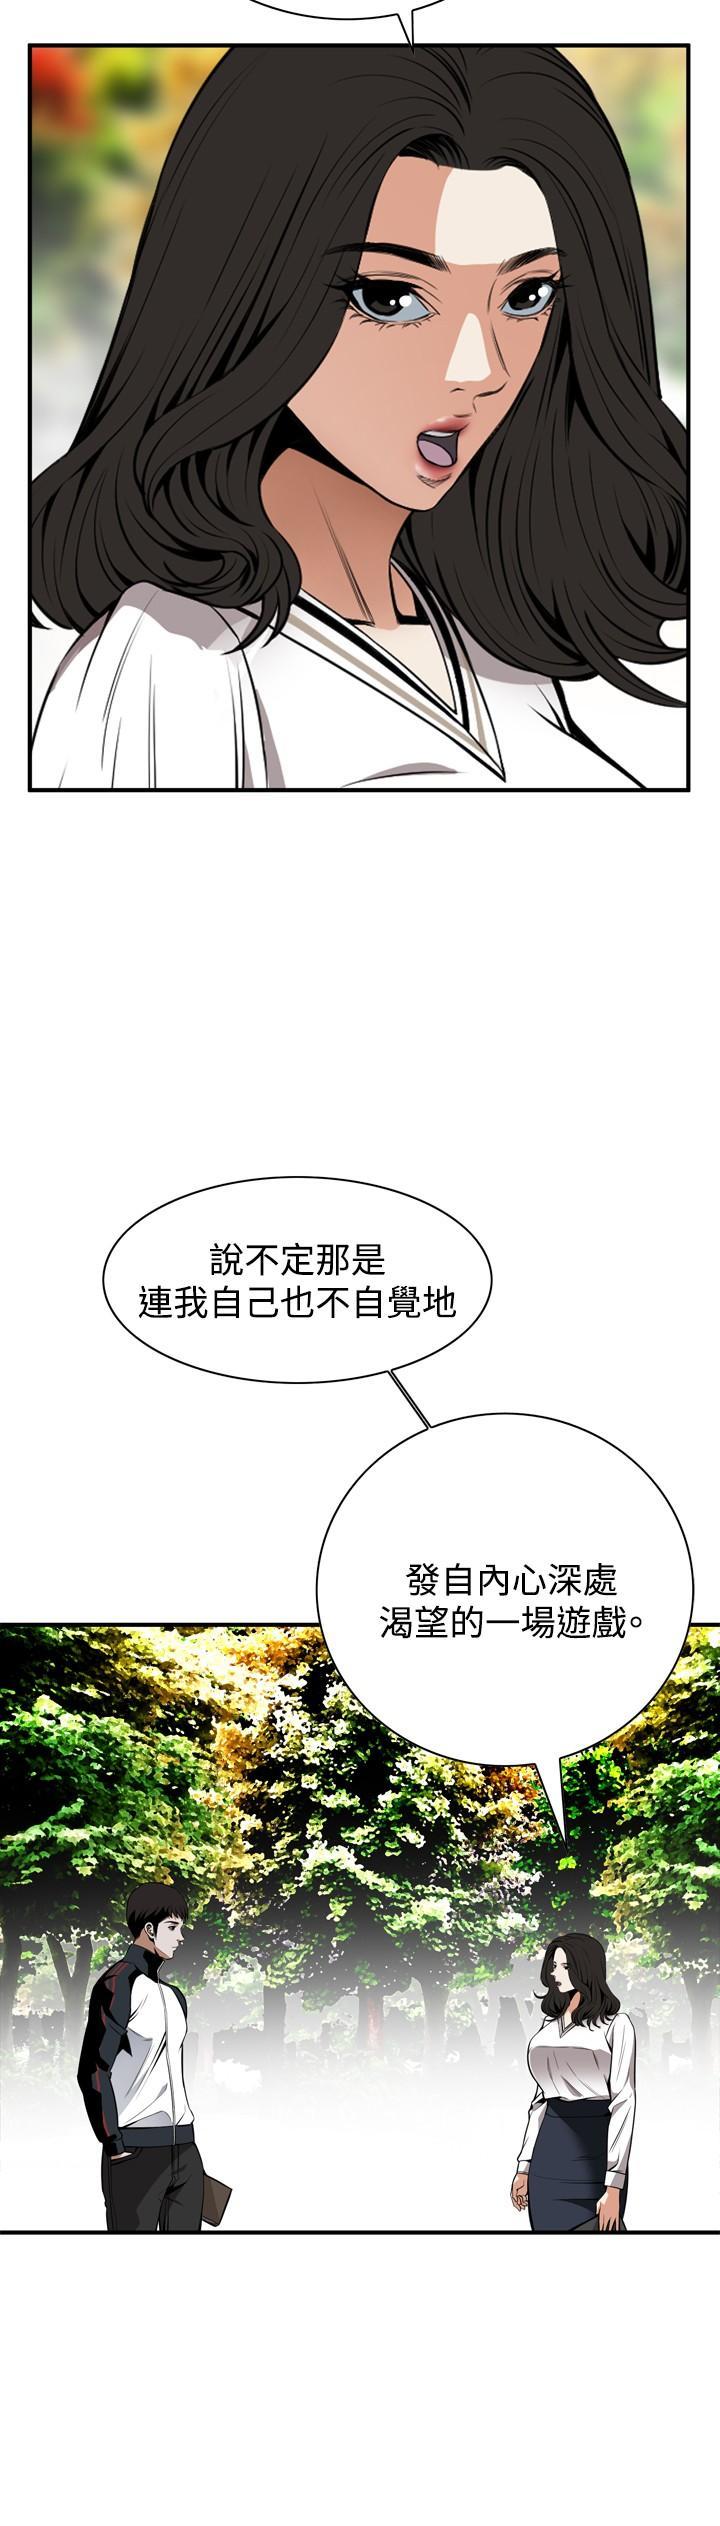 Take a Peek 偷窥 Ch.39~60 [Chinese]中文 97